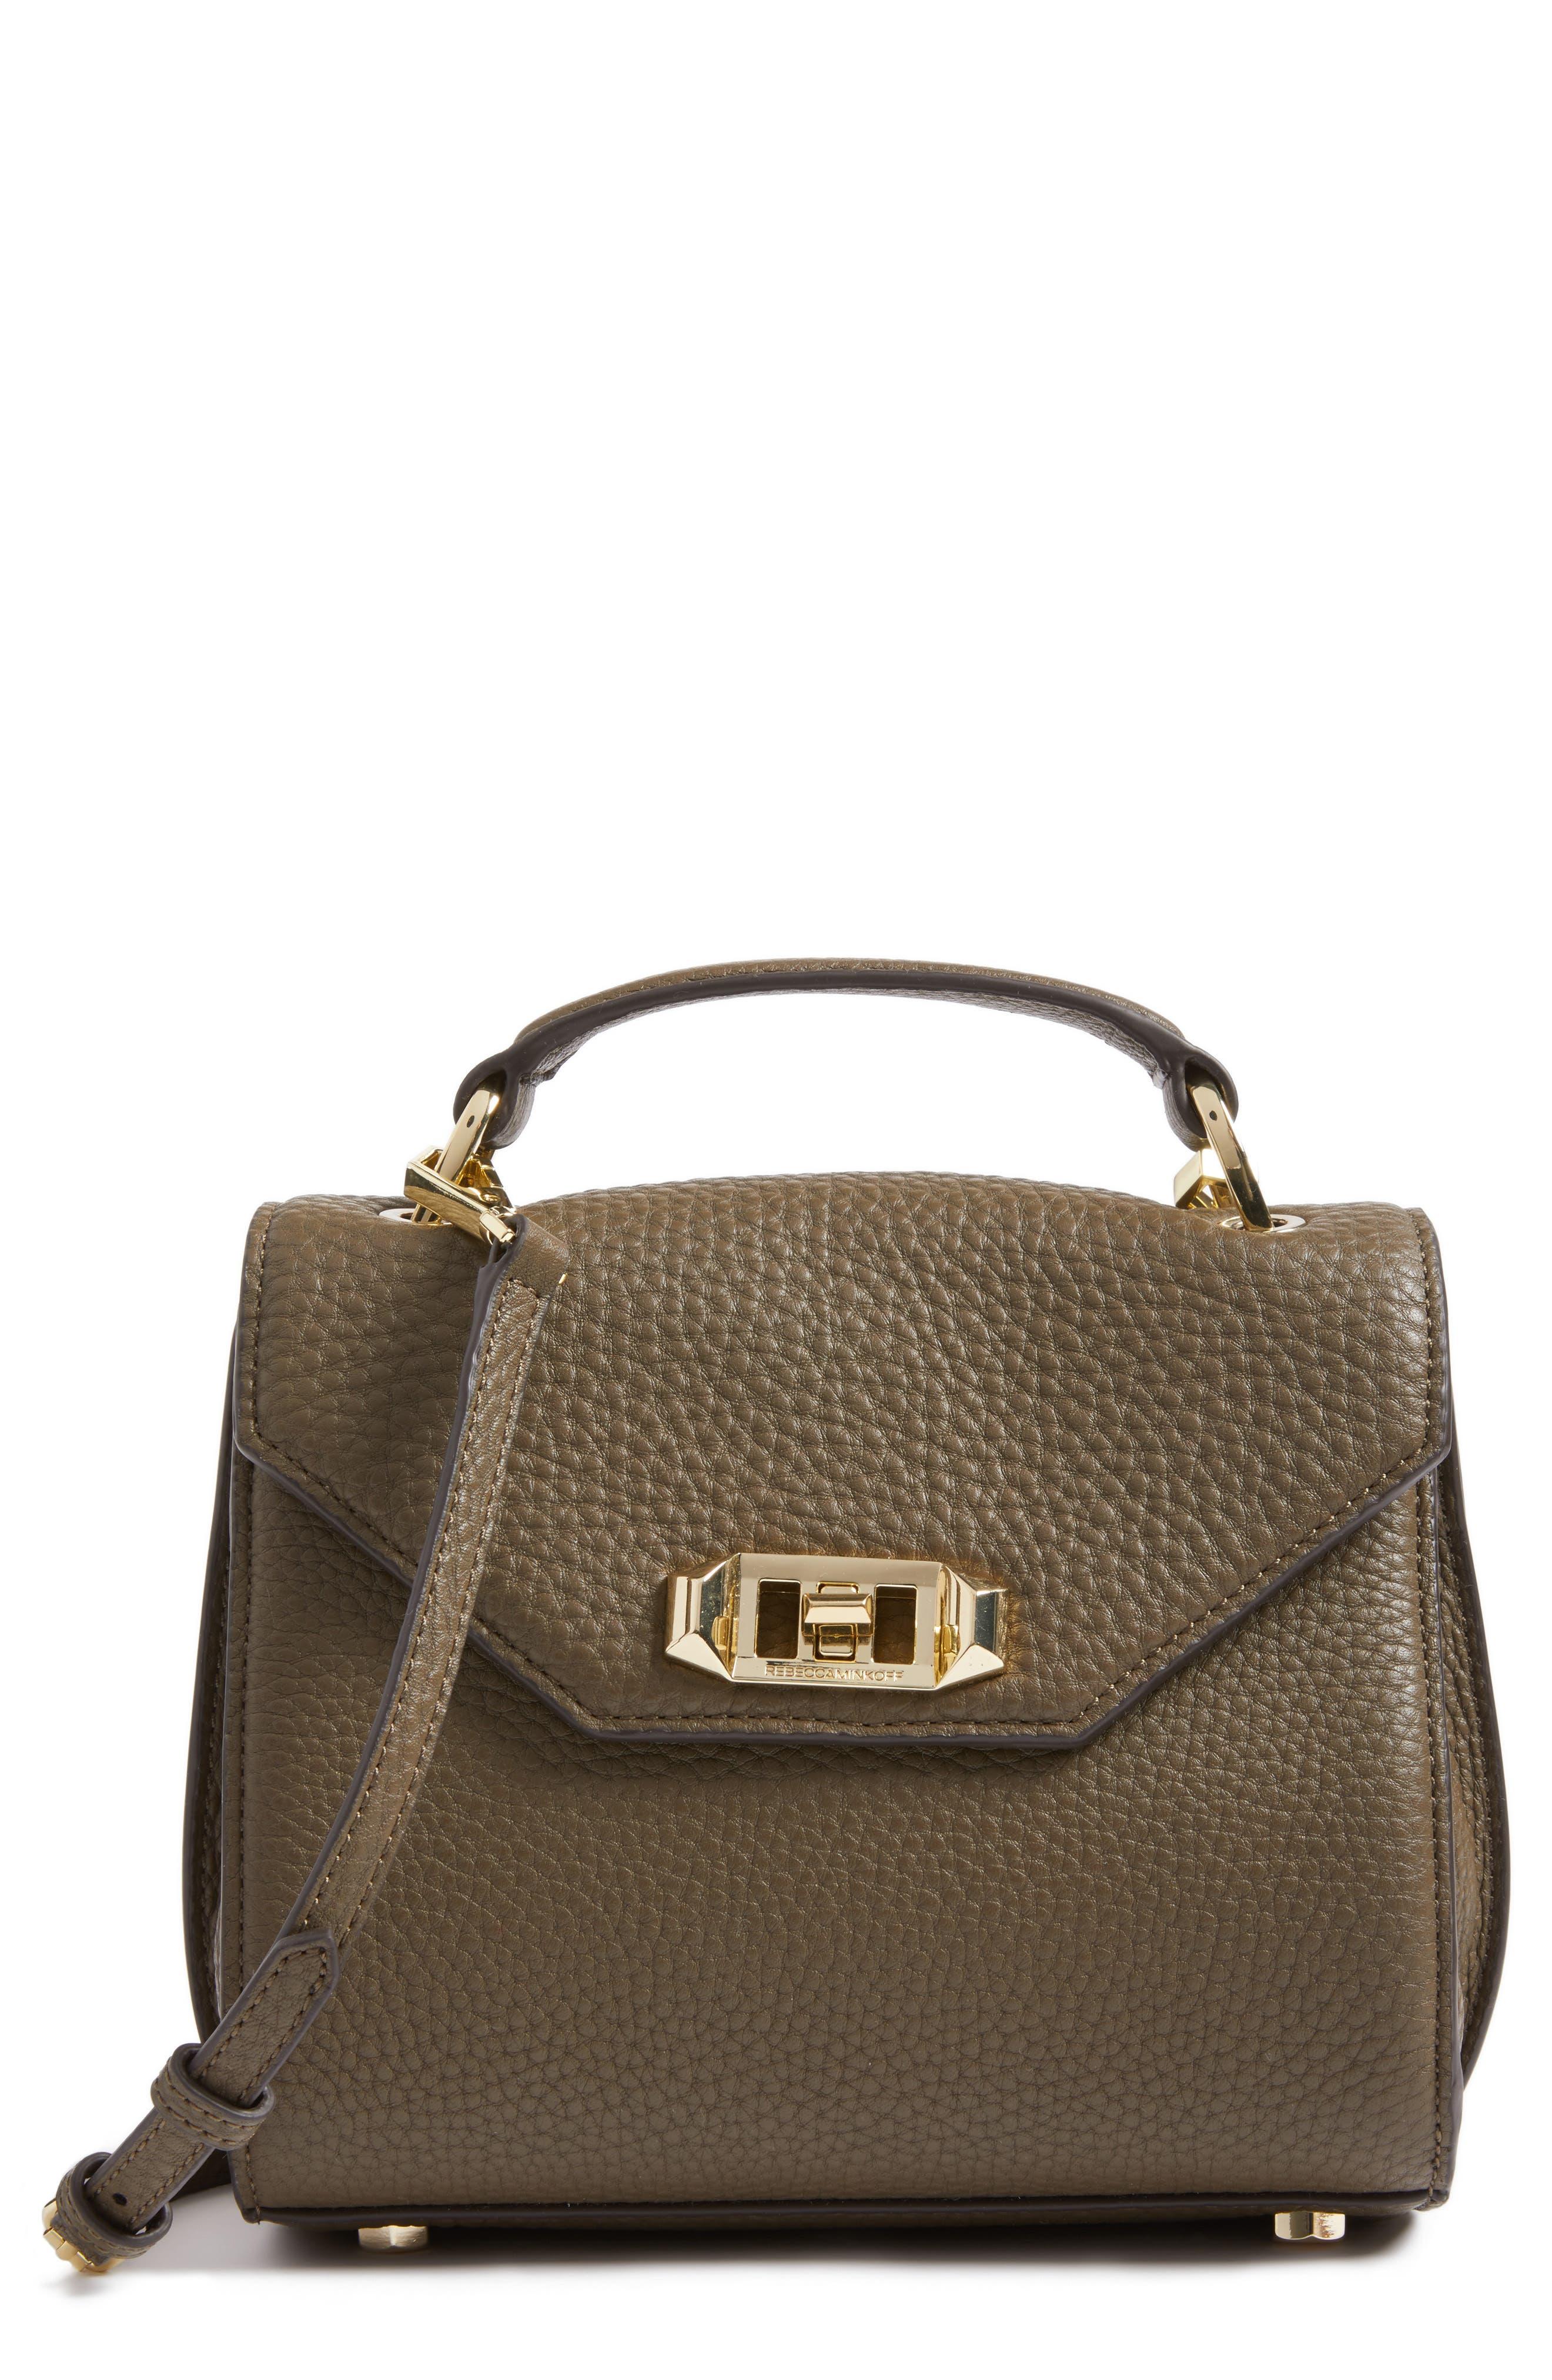 Main Image - Rebecca Minkoff Top Handle Leather Satchel (Nordstrom Exclusive)